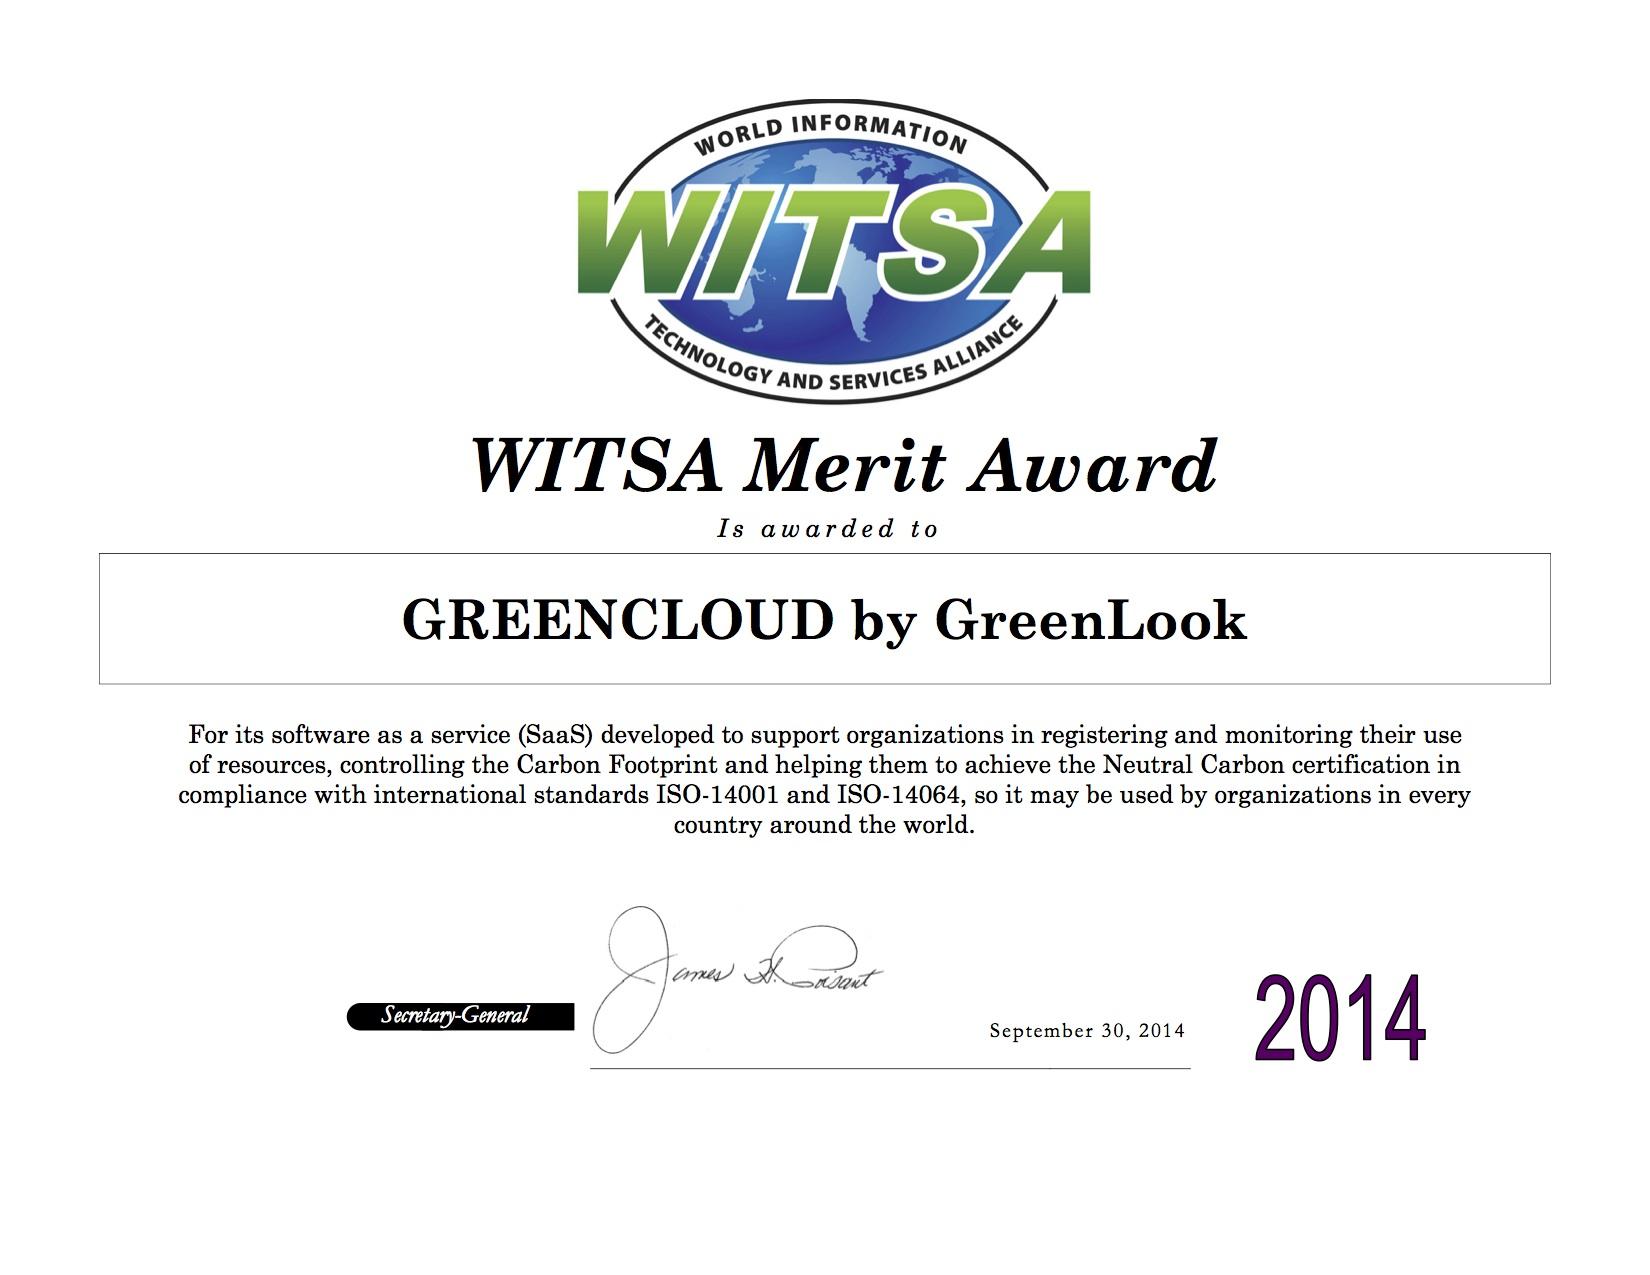 WITSA-2014MeritWinnerCertificate_GREENCLOUD.jpg